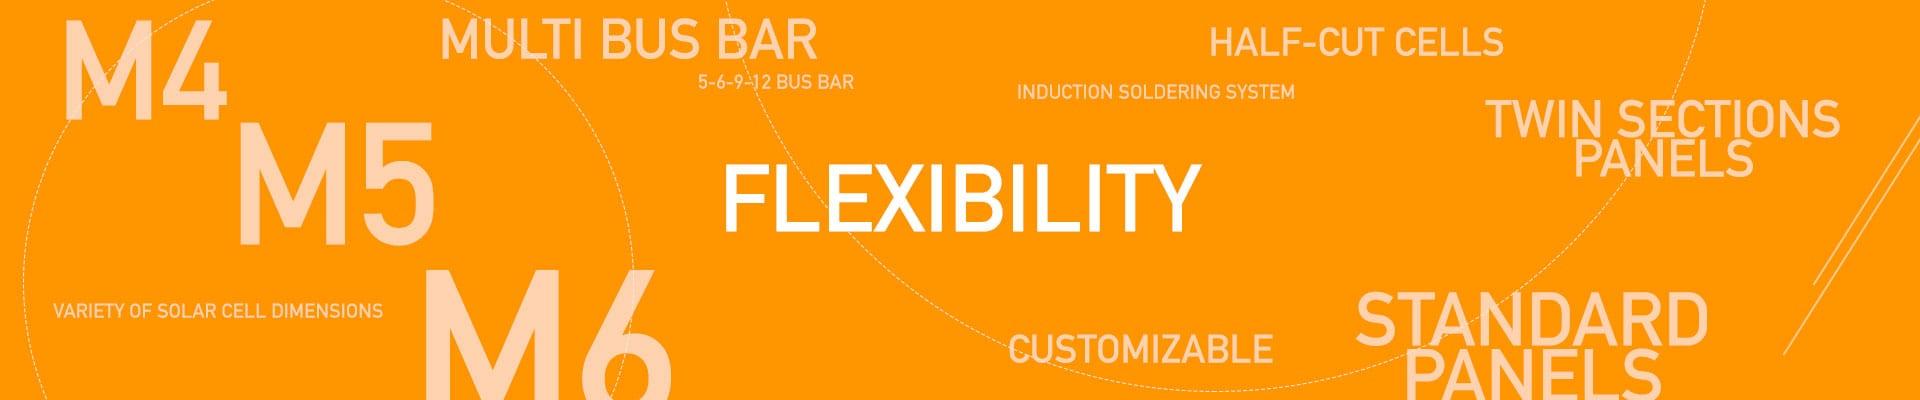 Ecoprogetti flexible dynamic automatic bussing